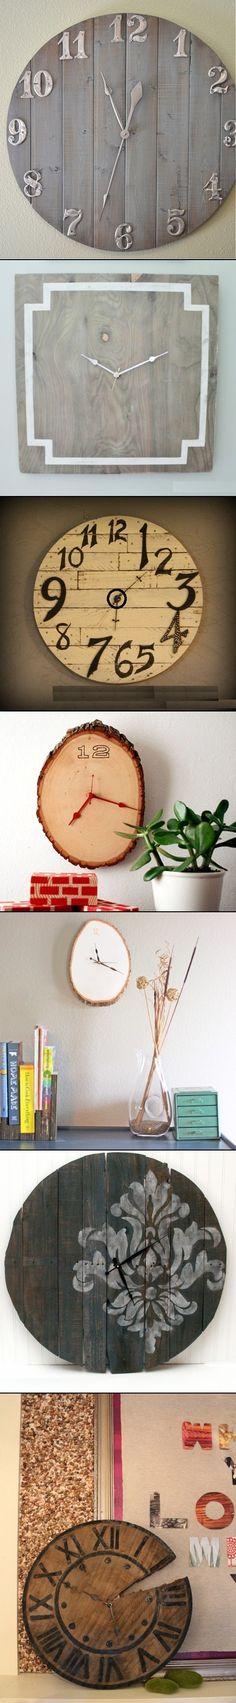 DIY wall art decor ideas